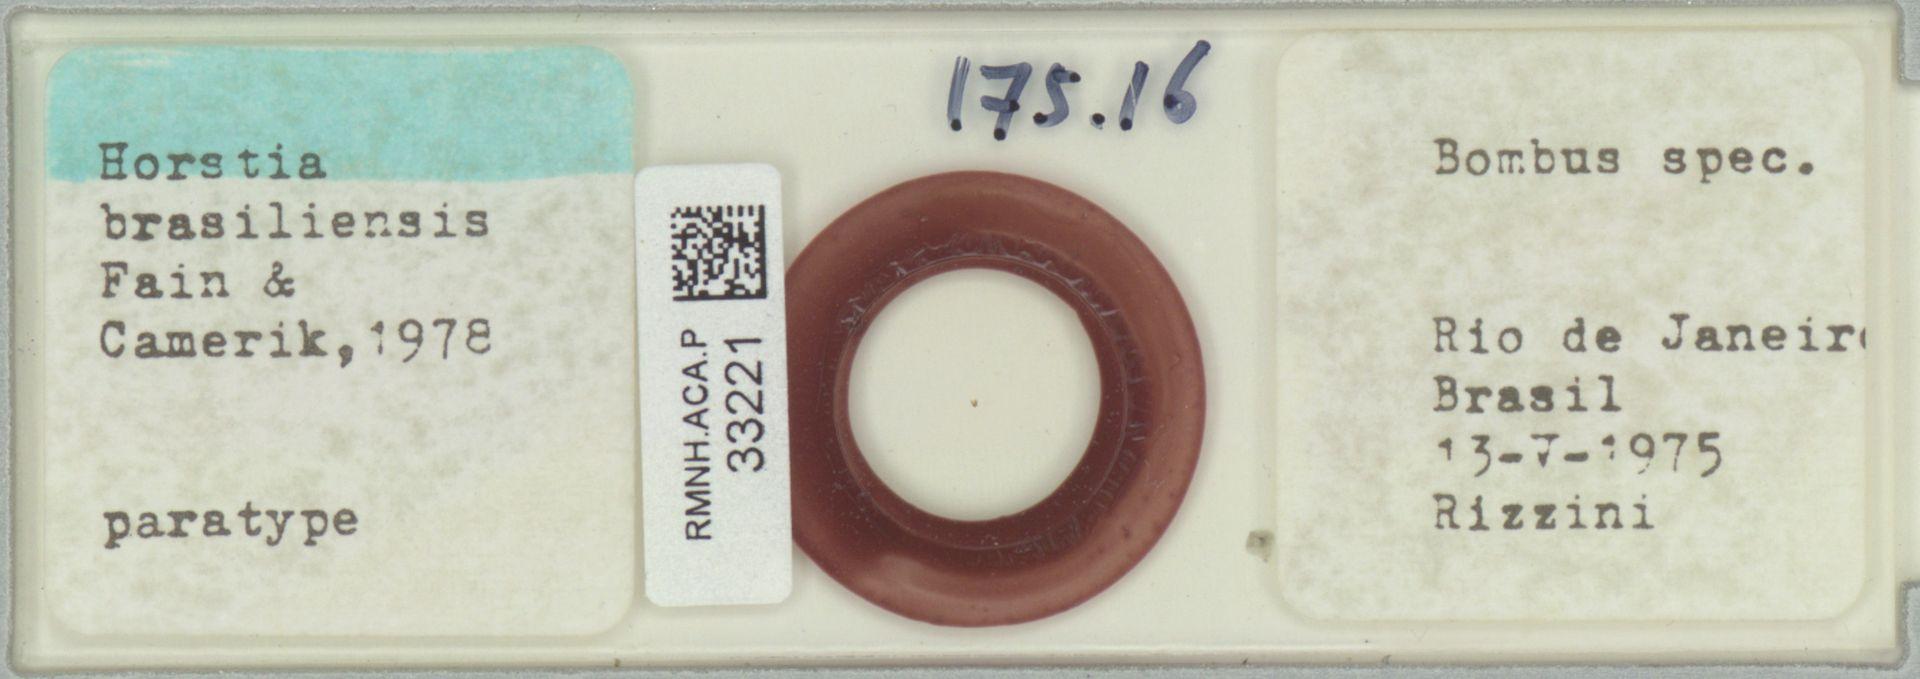 RMNH.ACA.P.33221 | Horstia brasiliensis Fain & Camerik, 1978